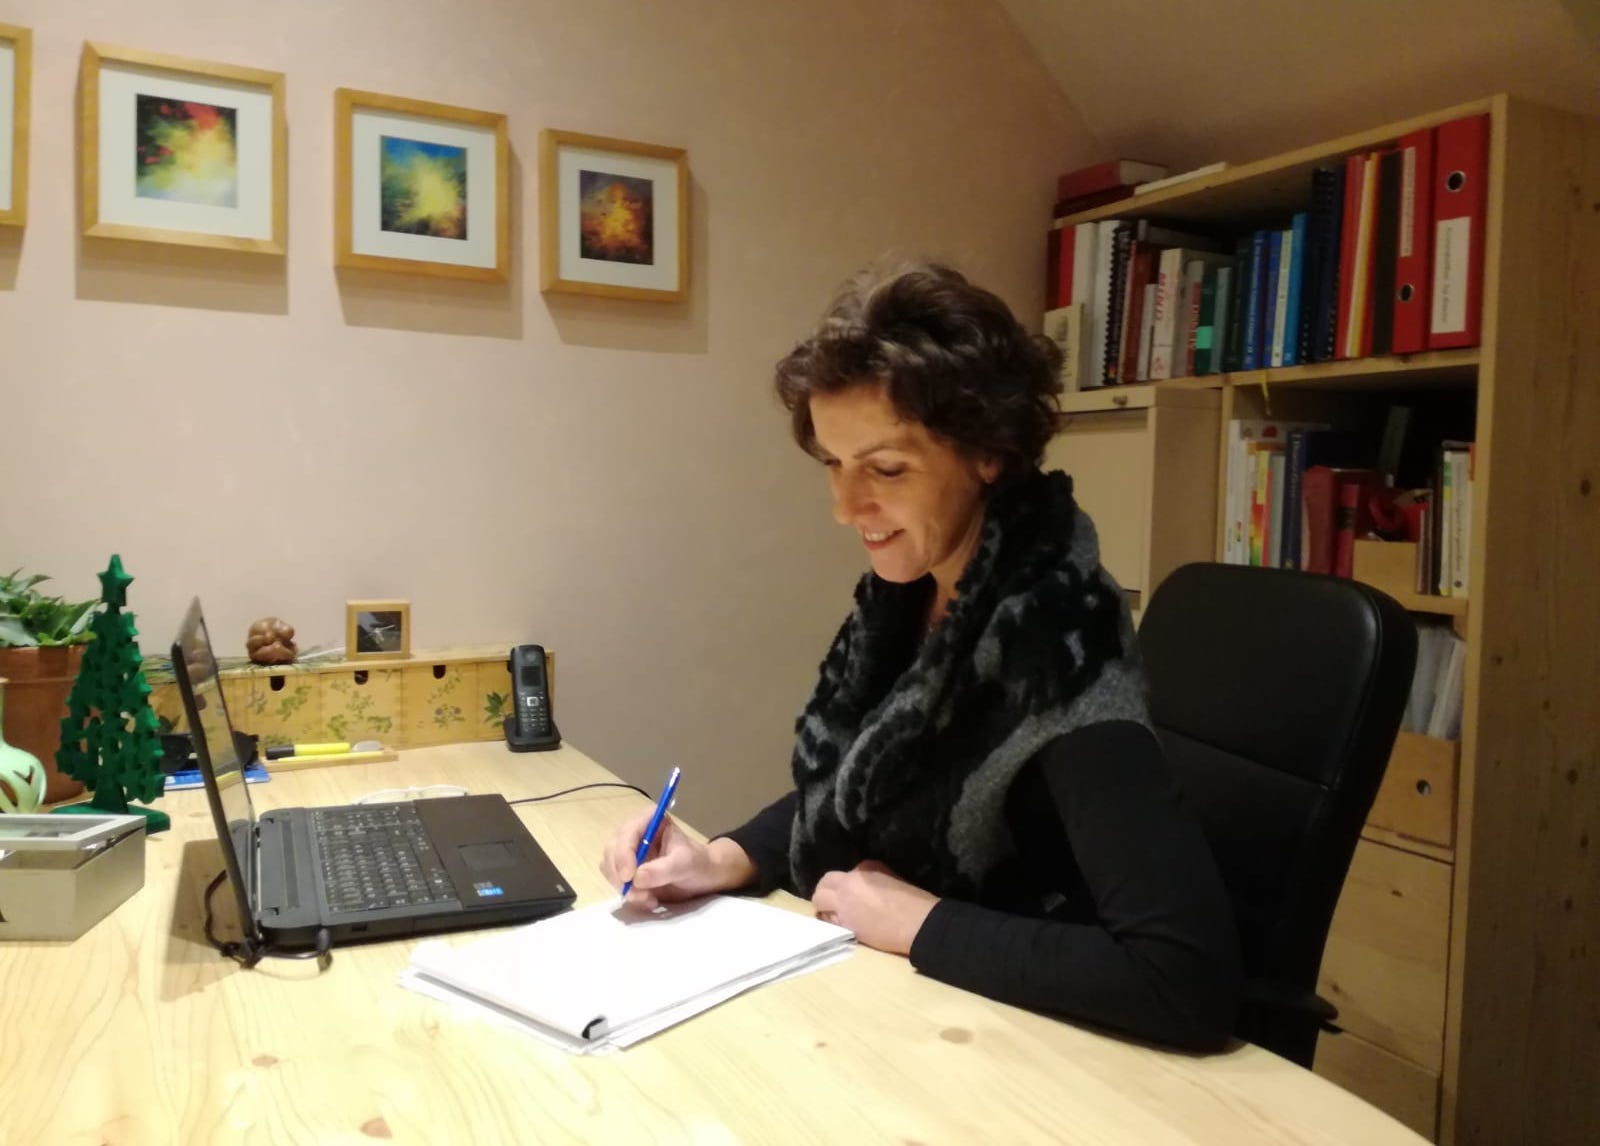 Margie van Mierlo